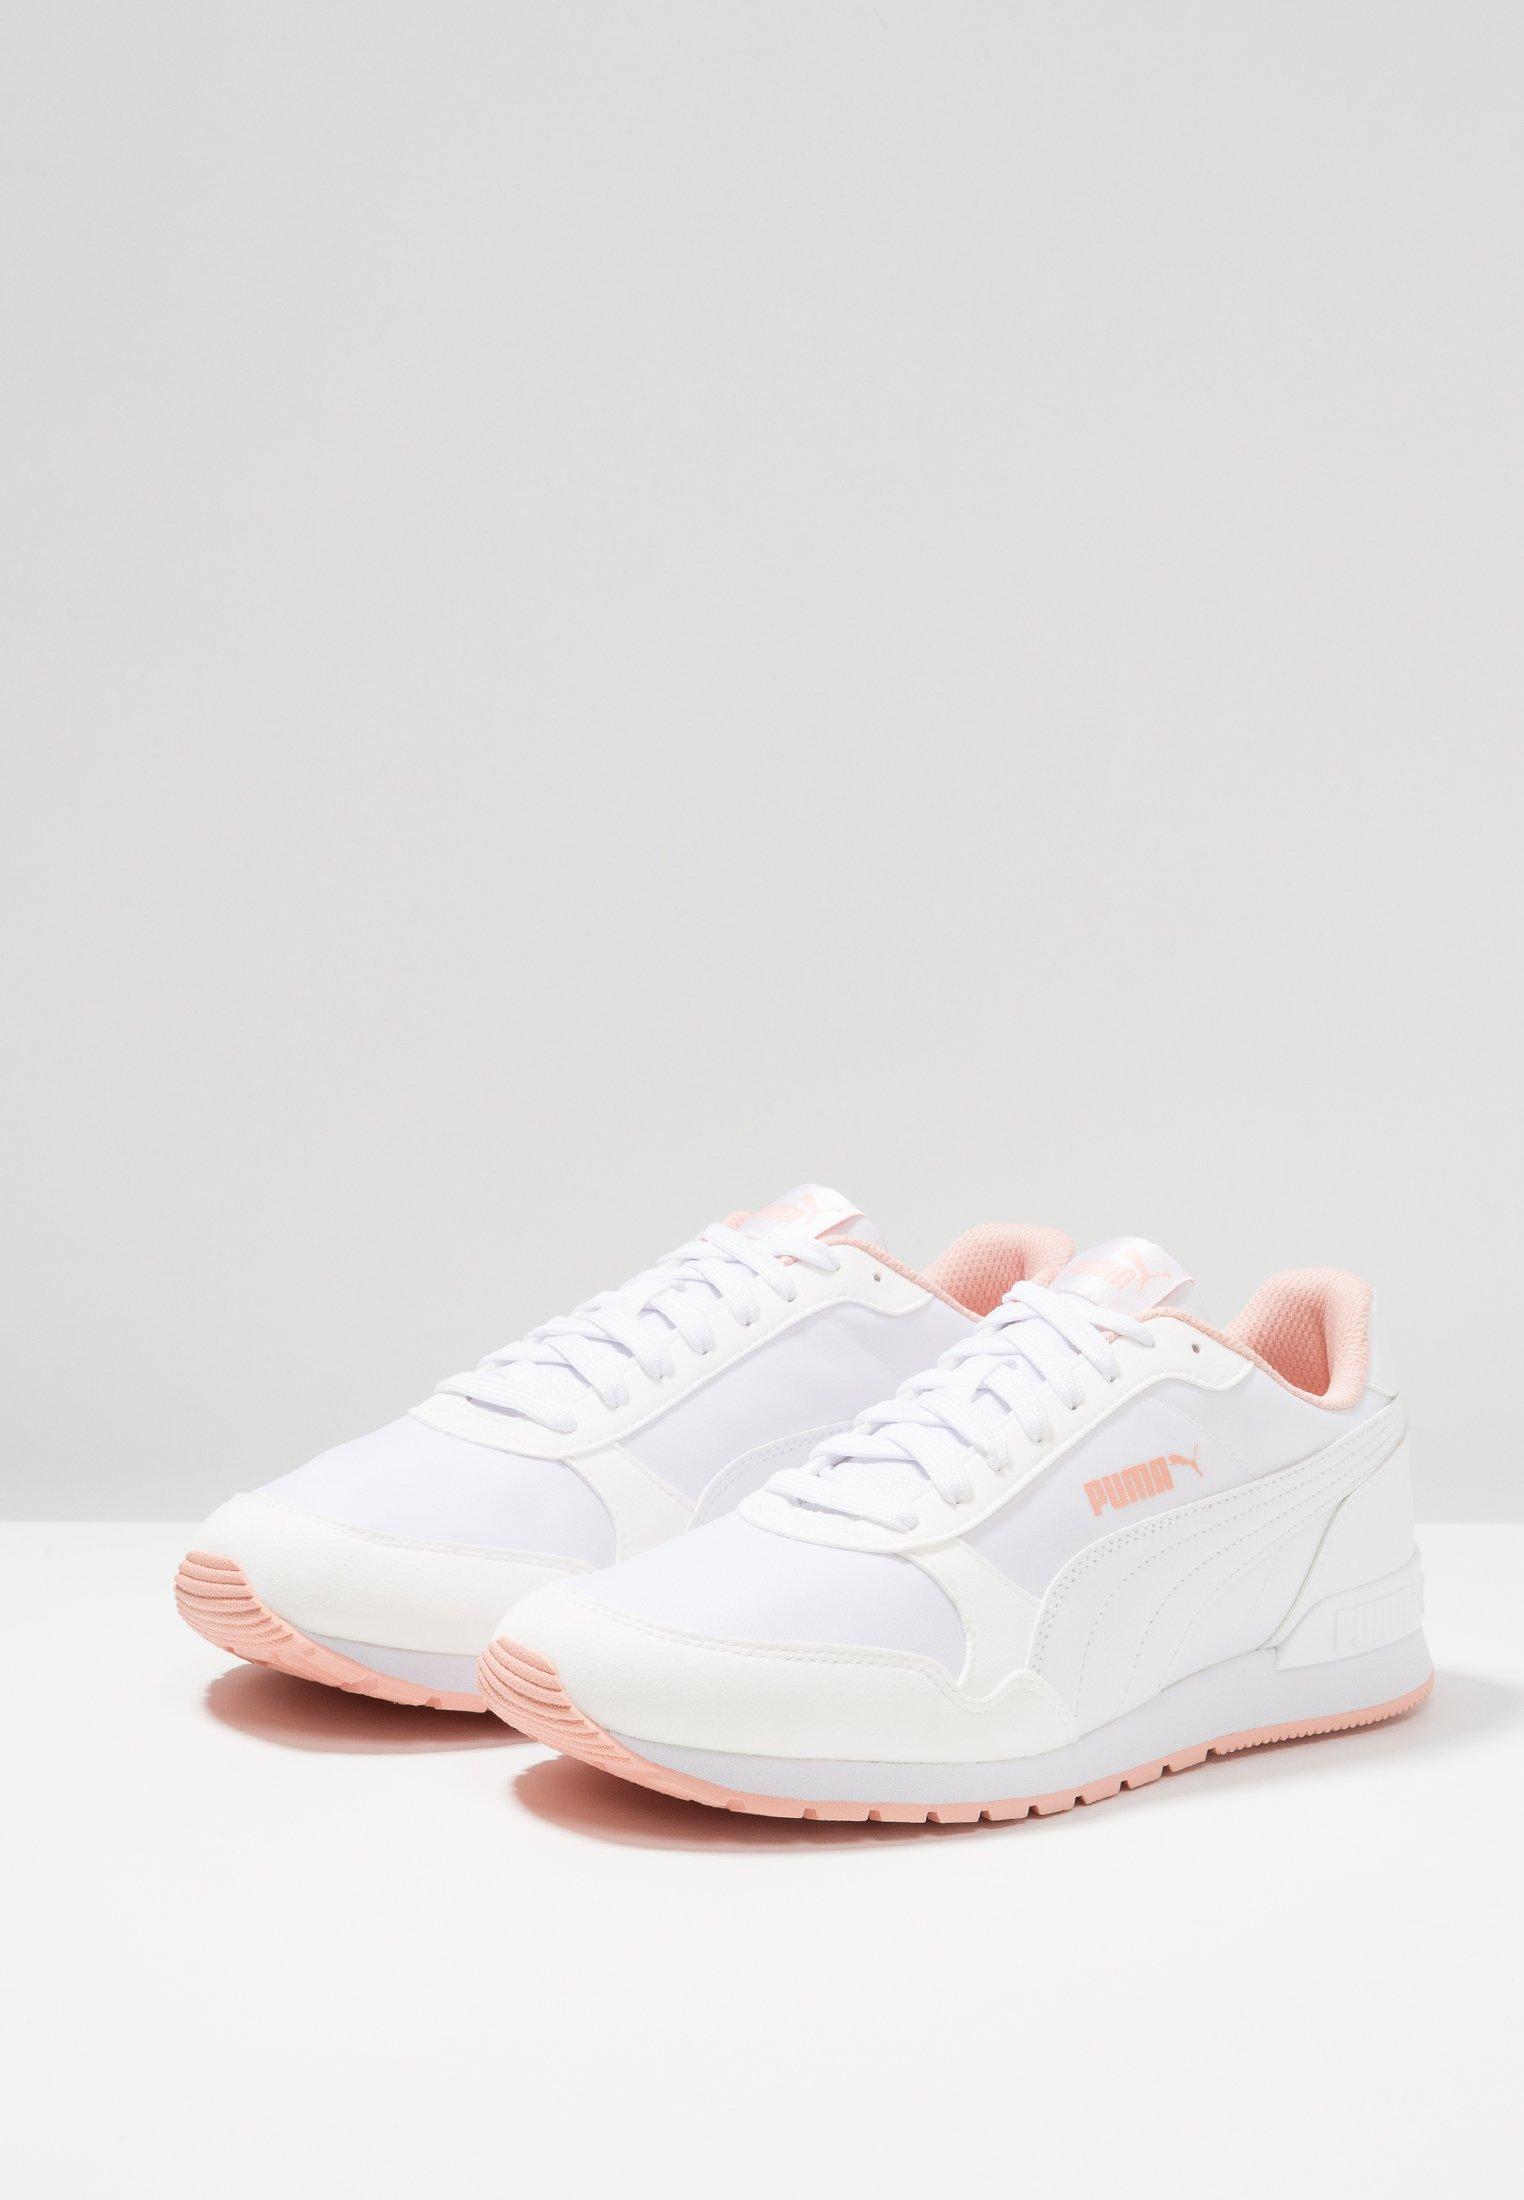 Puma Runner - Sneaker Low White/peach Bud Black Friday